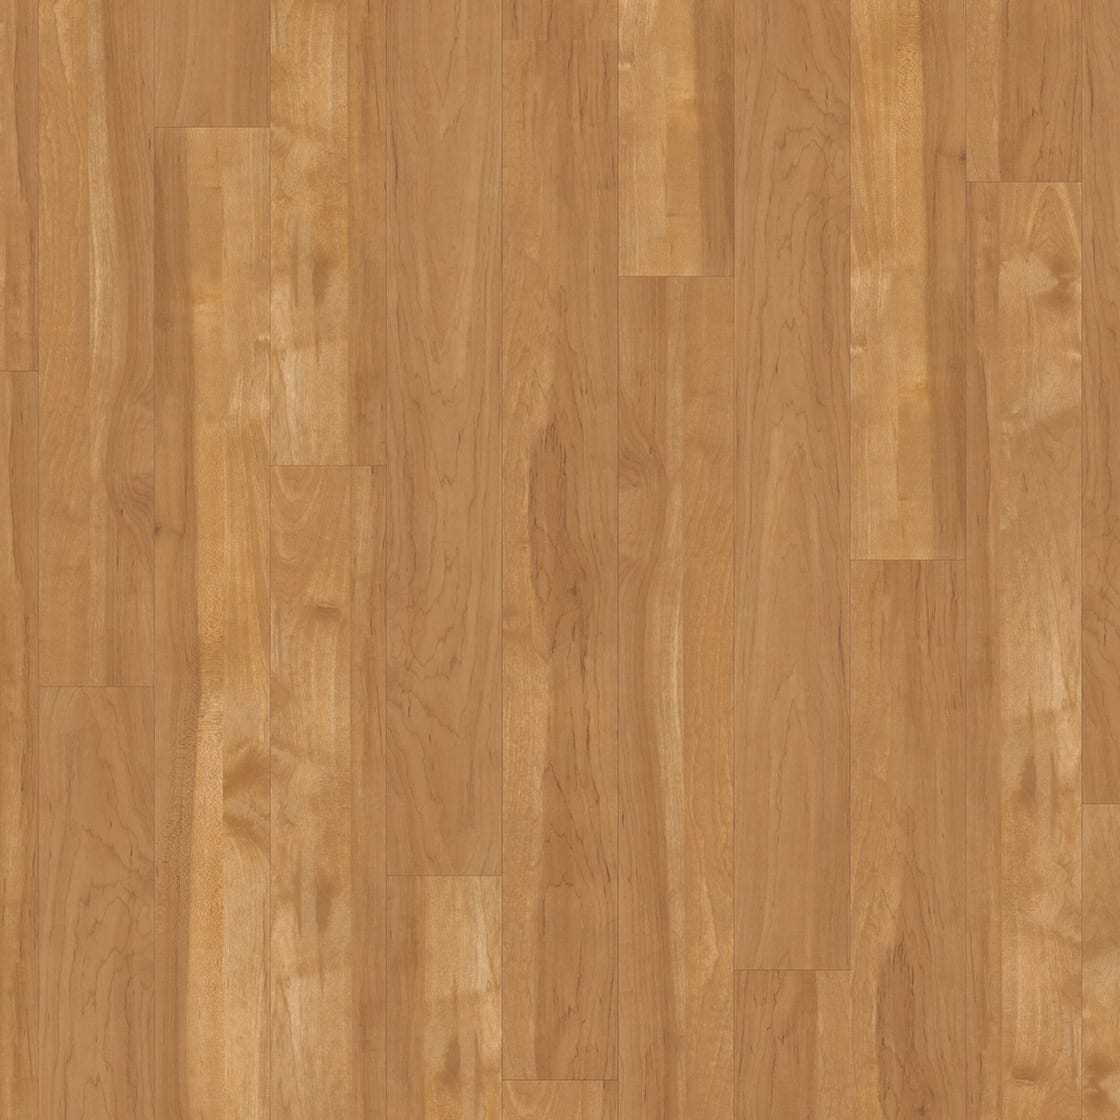 Karndean Knight Tile Wood Vinyl Plank Flooring Mckenzie Amp Willis